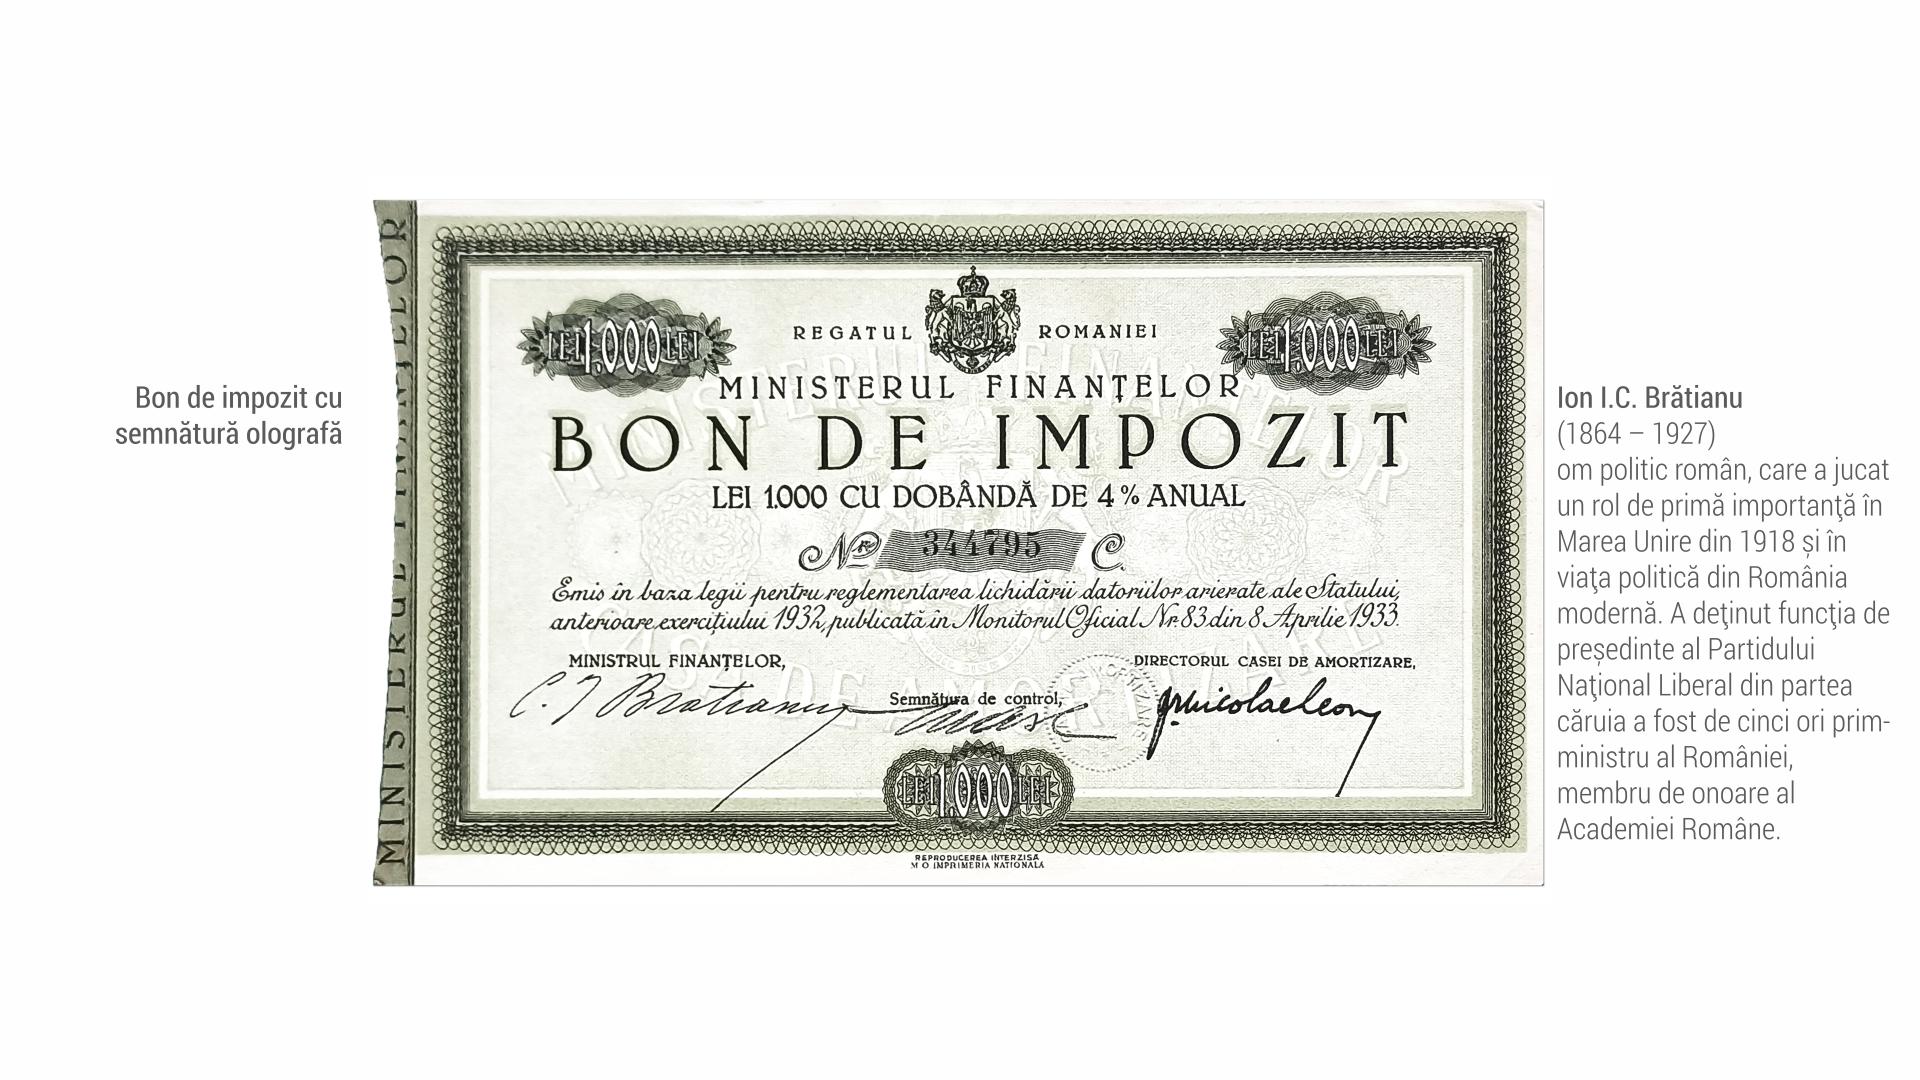 1864 Ion I C Bratianu - Bon de impozit